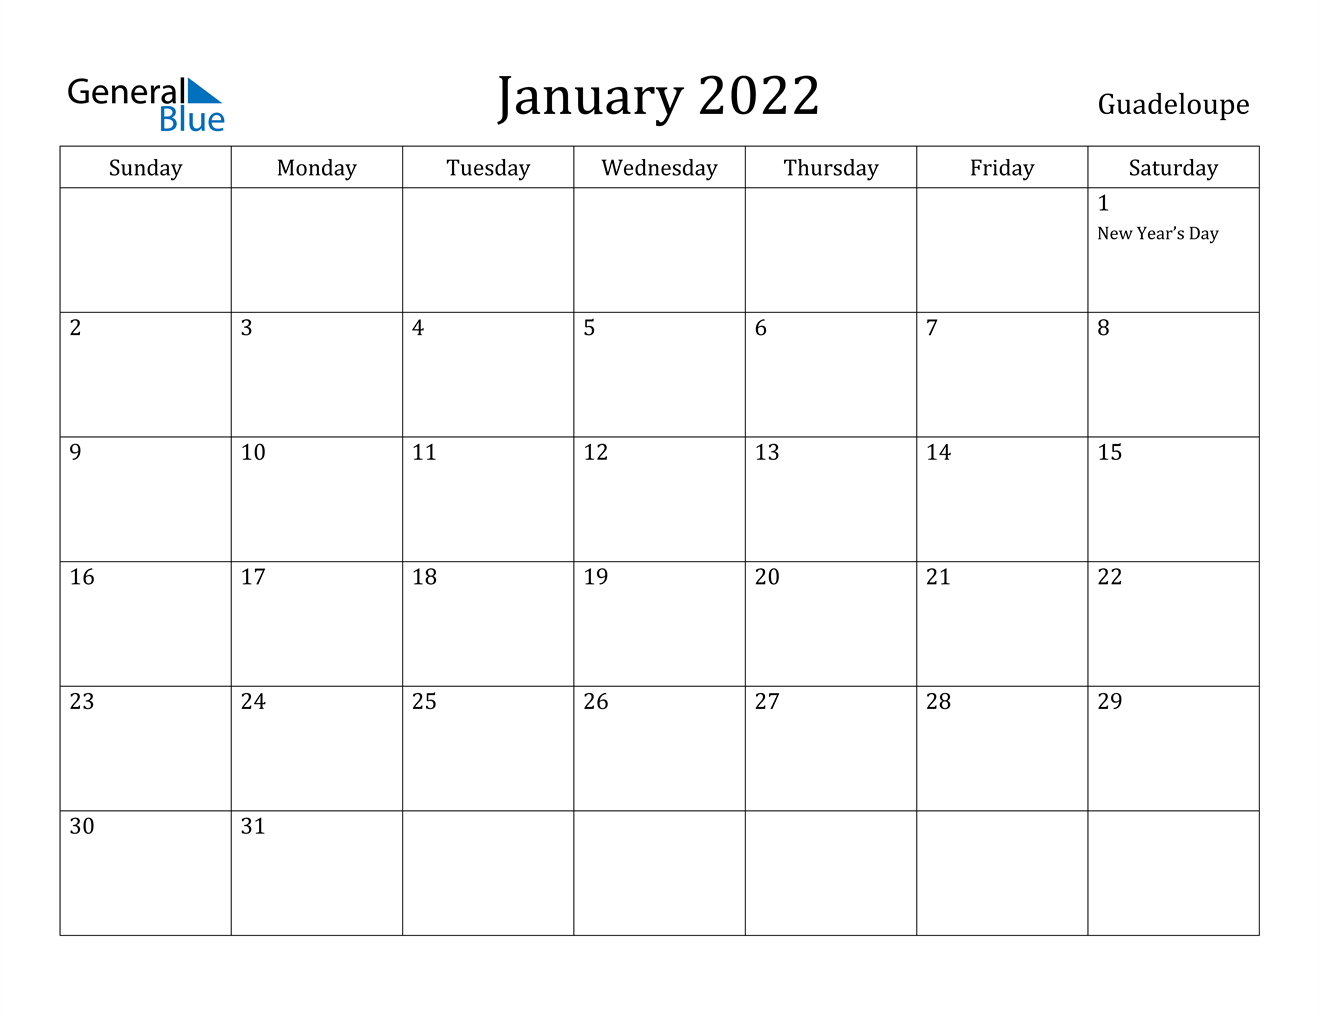 January 2022 Calendar - Guadeloupe